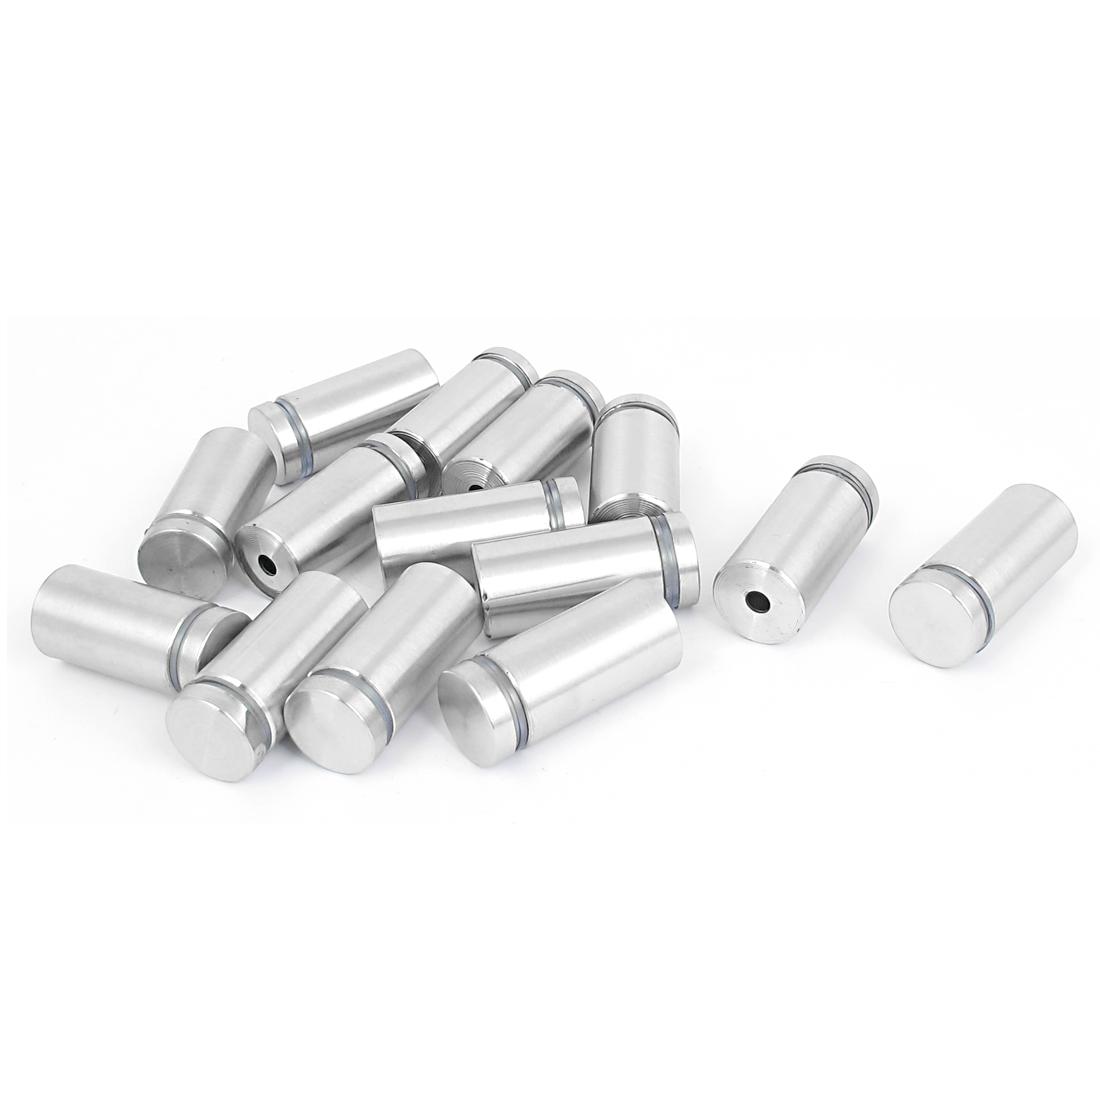 19mm x 40mm Stainless Steel Advertising Frameless Glass Standoff Pins 14pcs